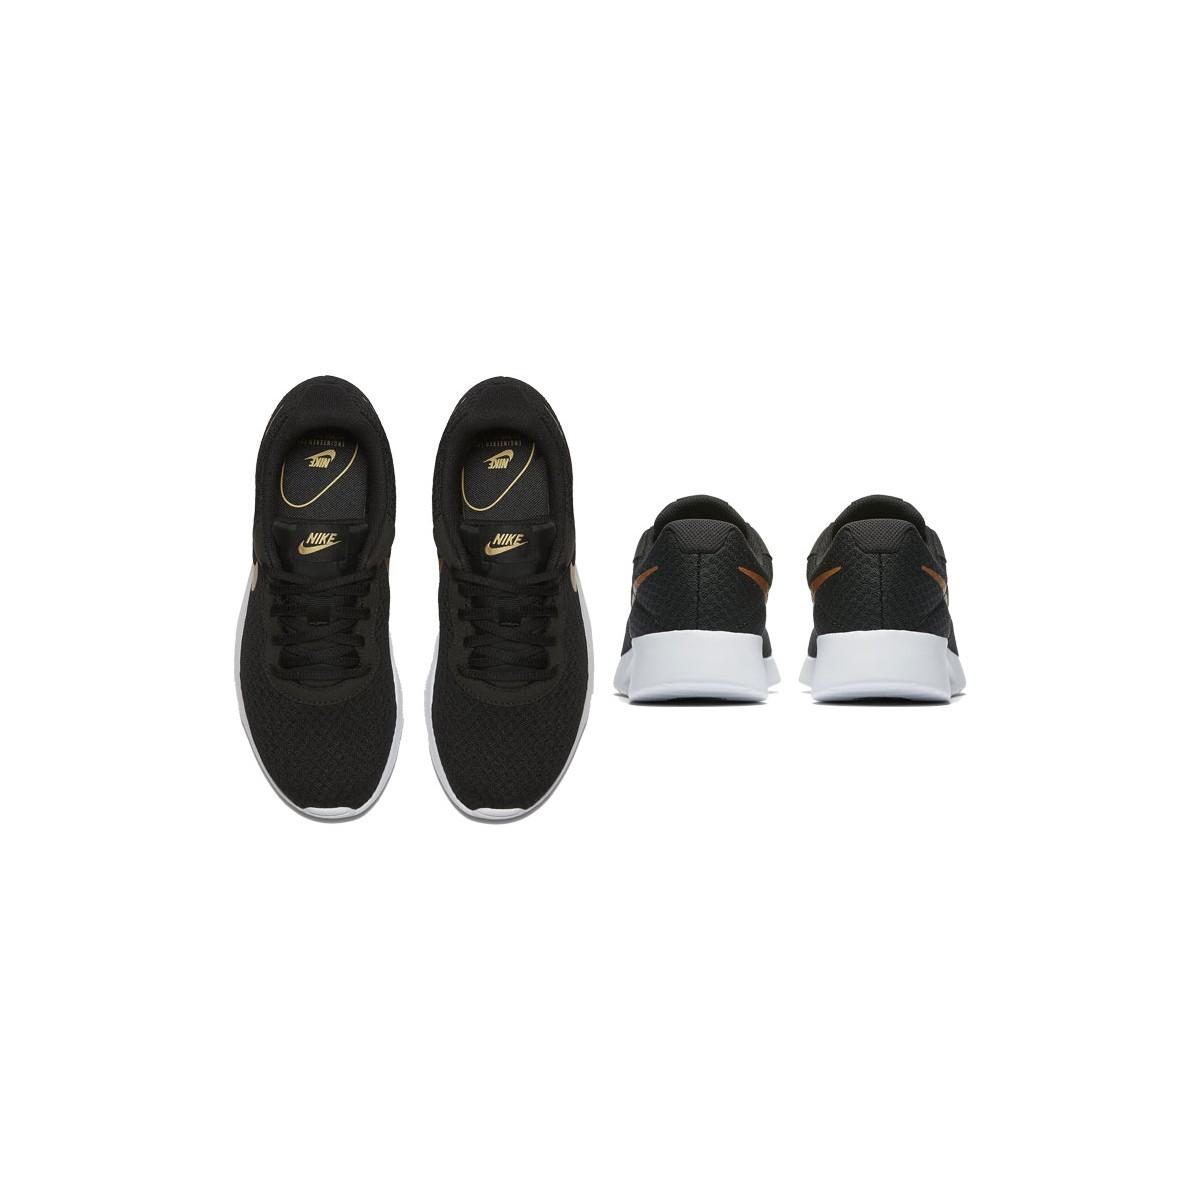 Nike tanjun zapatillas mujer 812655 004 negro y dorado AC7yEW